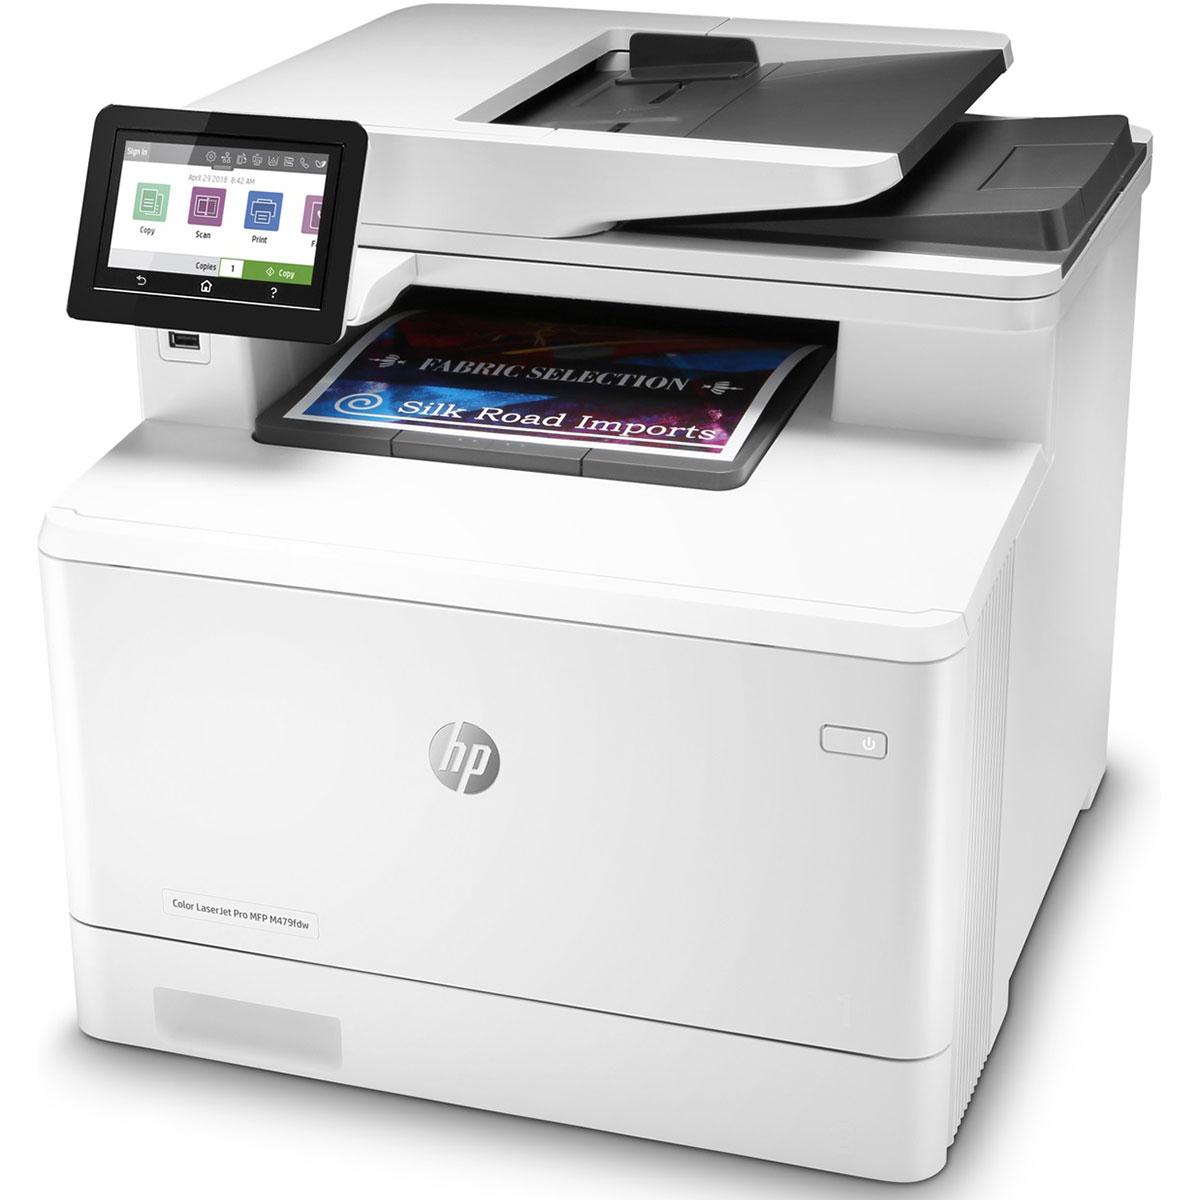 HP Color LaserJet Pro M479fdw מדפסת לייזר